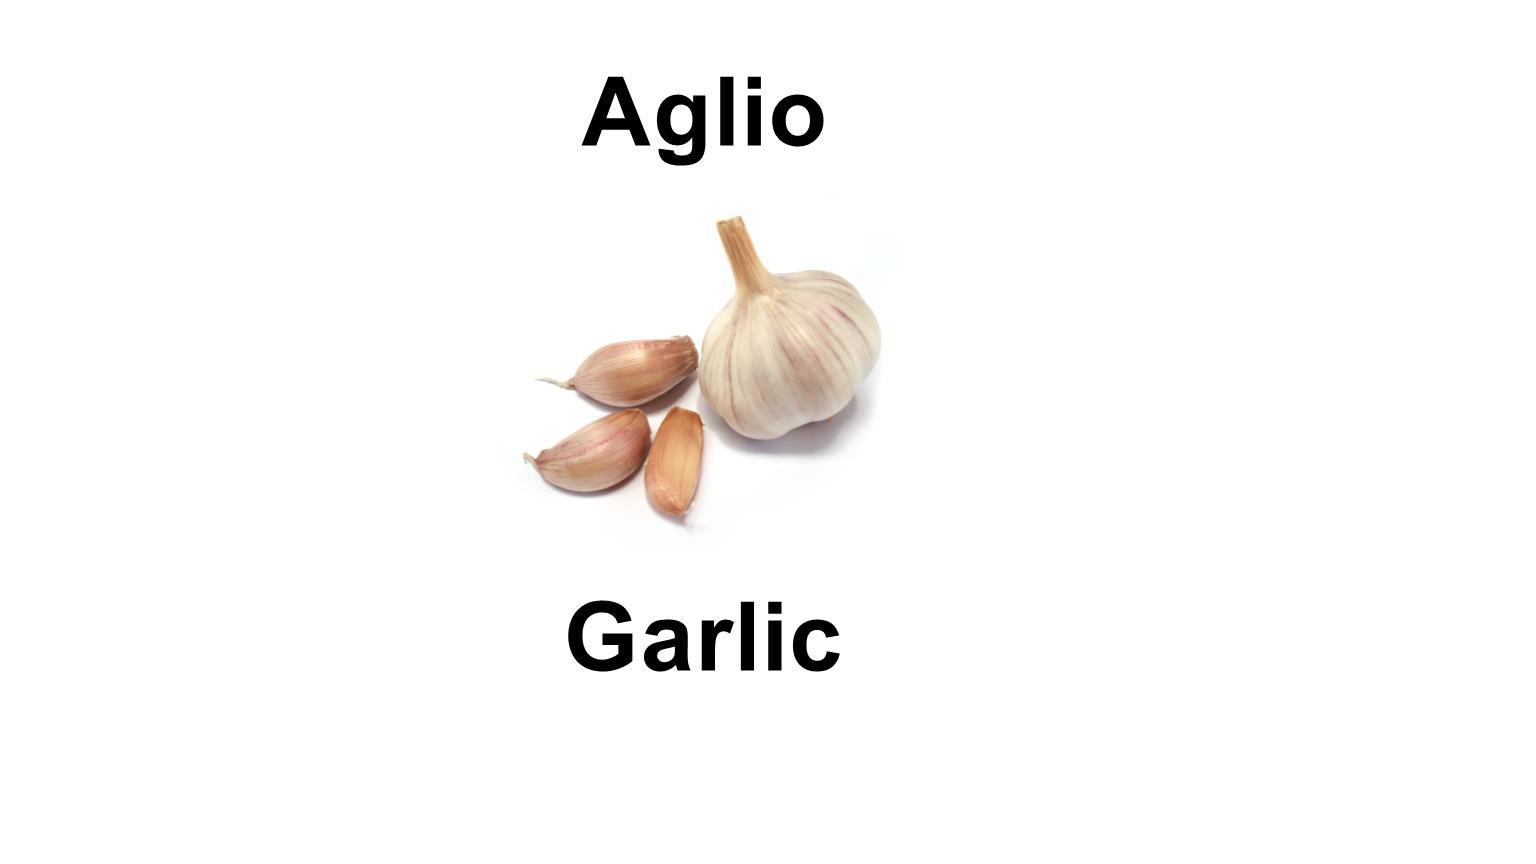 italian vocabulary italian food names of vegetables learn